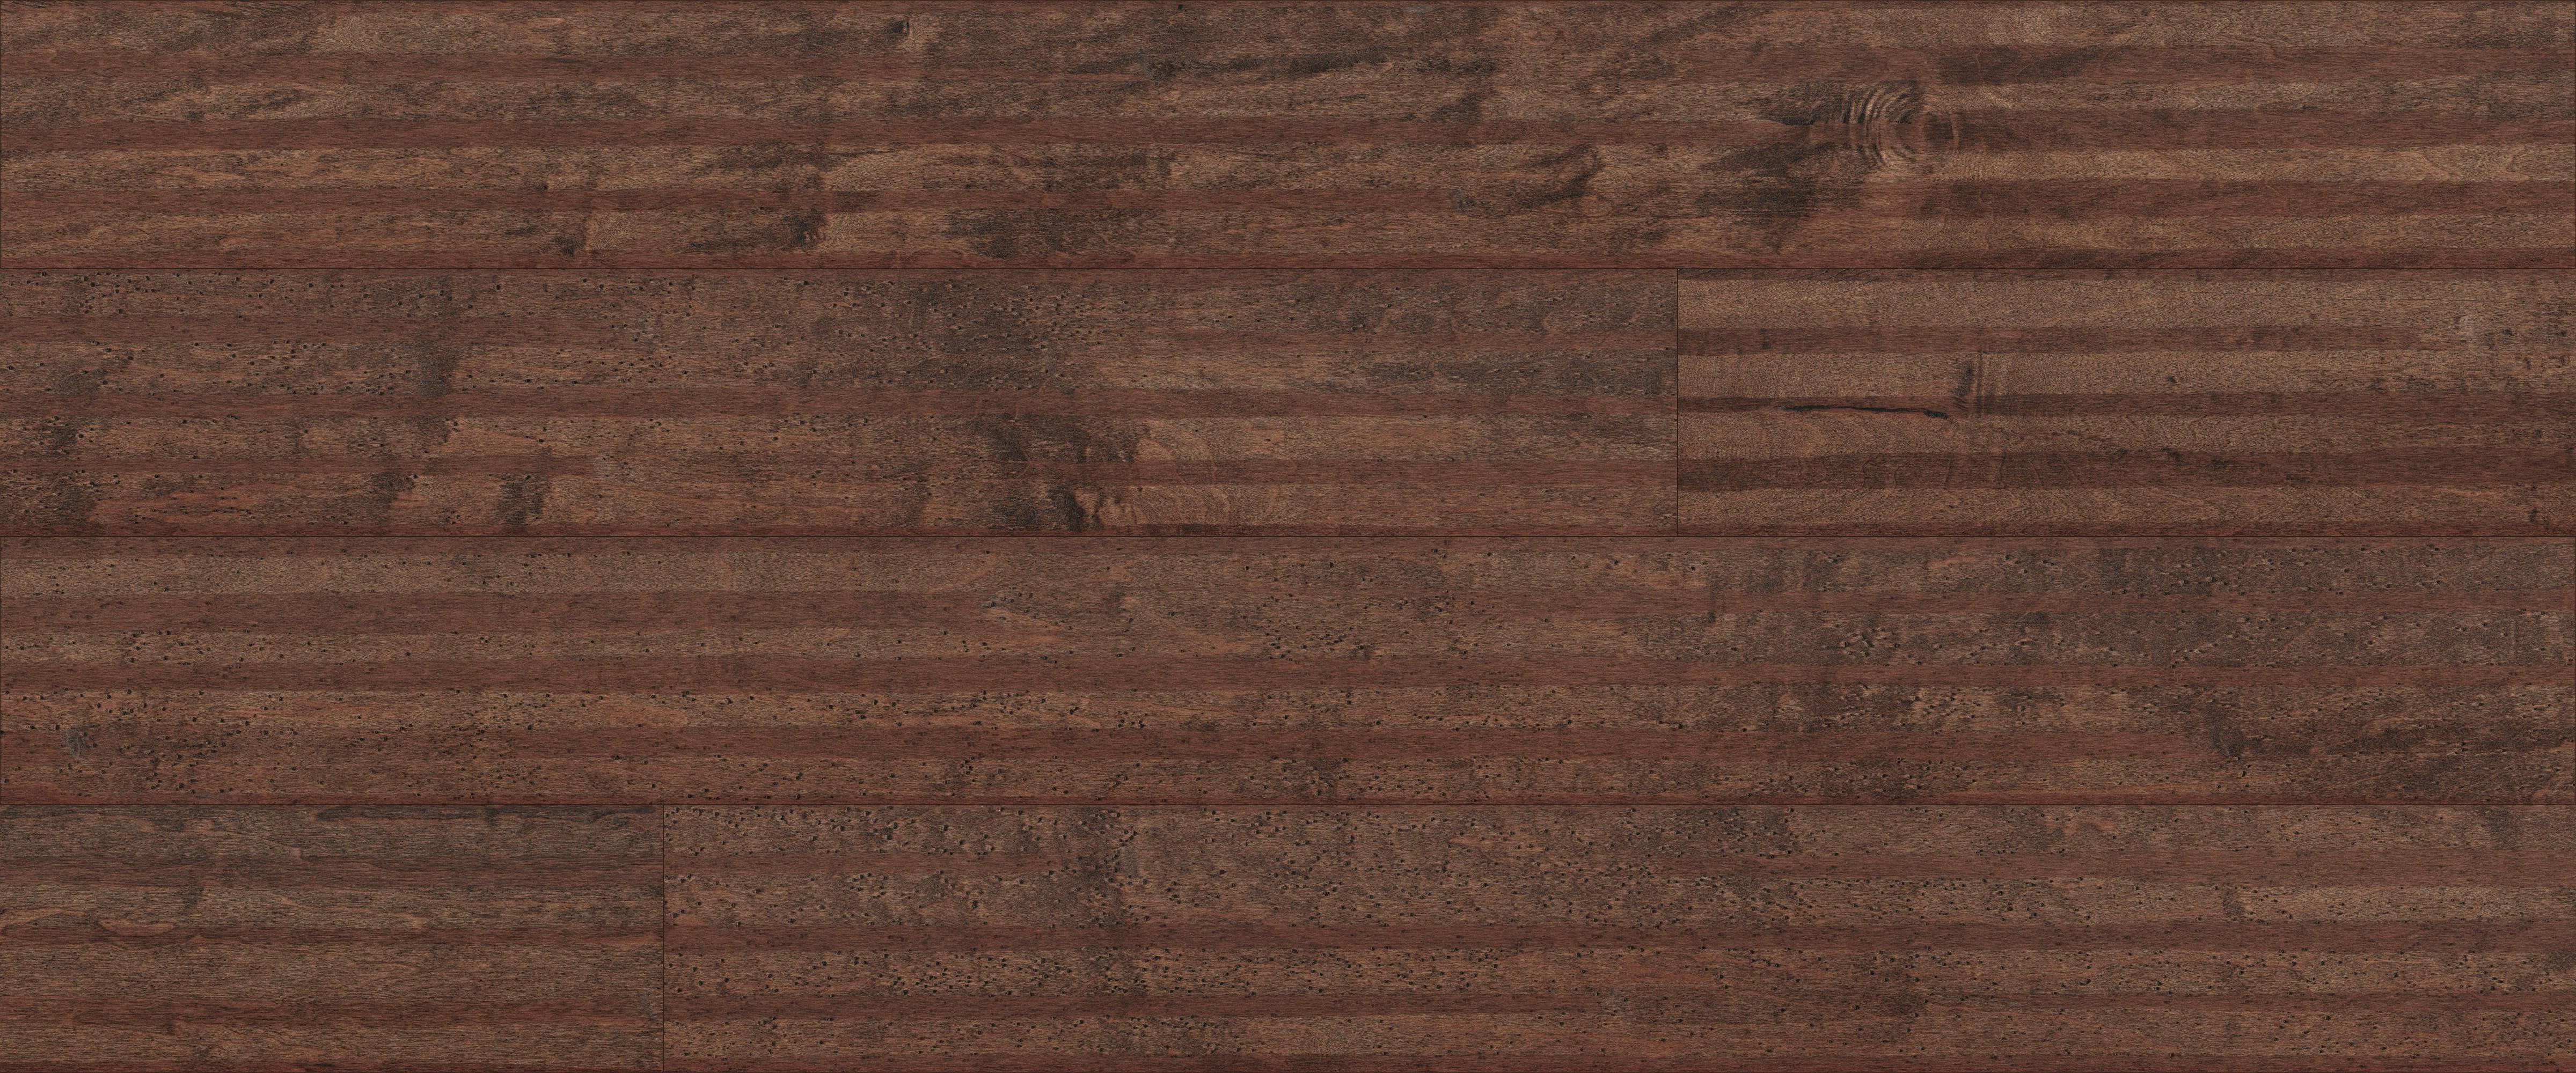 16 Unique 5 Inch Maple Hardwood Flooring 2021 free download 5 inch maple hardwood flooring of mullican lincolnshire sculpted maple autumn 5 engineered hardwood with regard to mullican lincolnshire sculpted maple autumn 5 engineered hardwood flooring